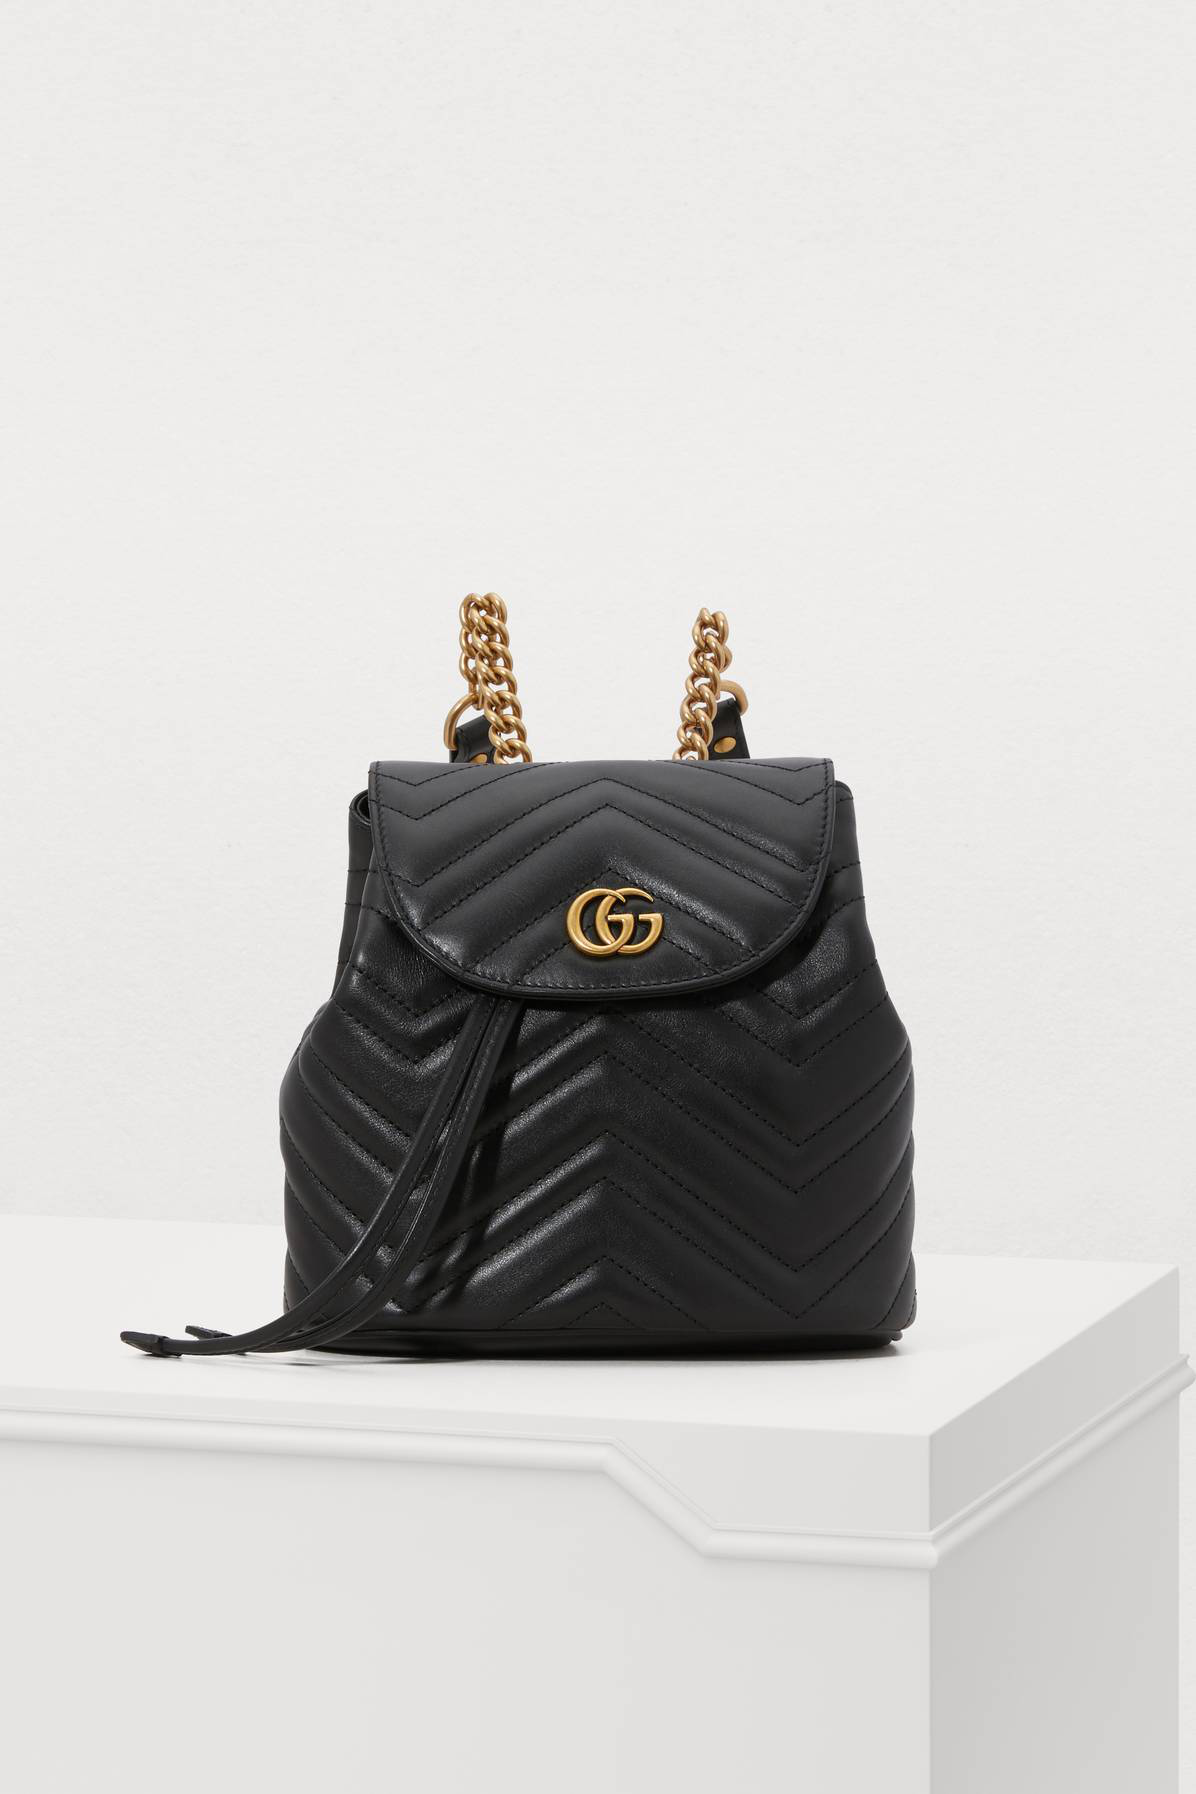 49f91dd40 Gucci Gg Marmont 2.0 Matelasse Leather Mini Backpack - Black | ModeSens